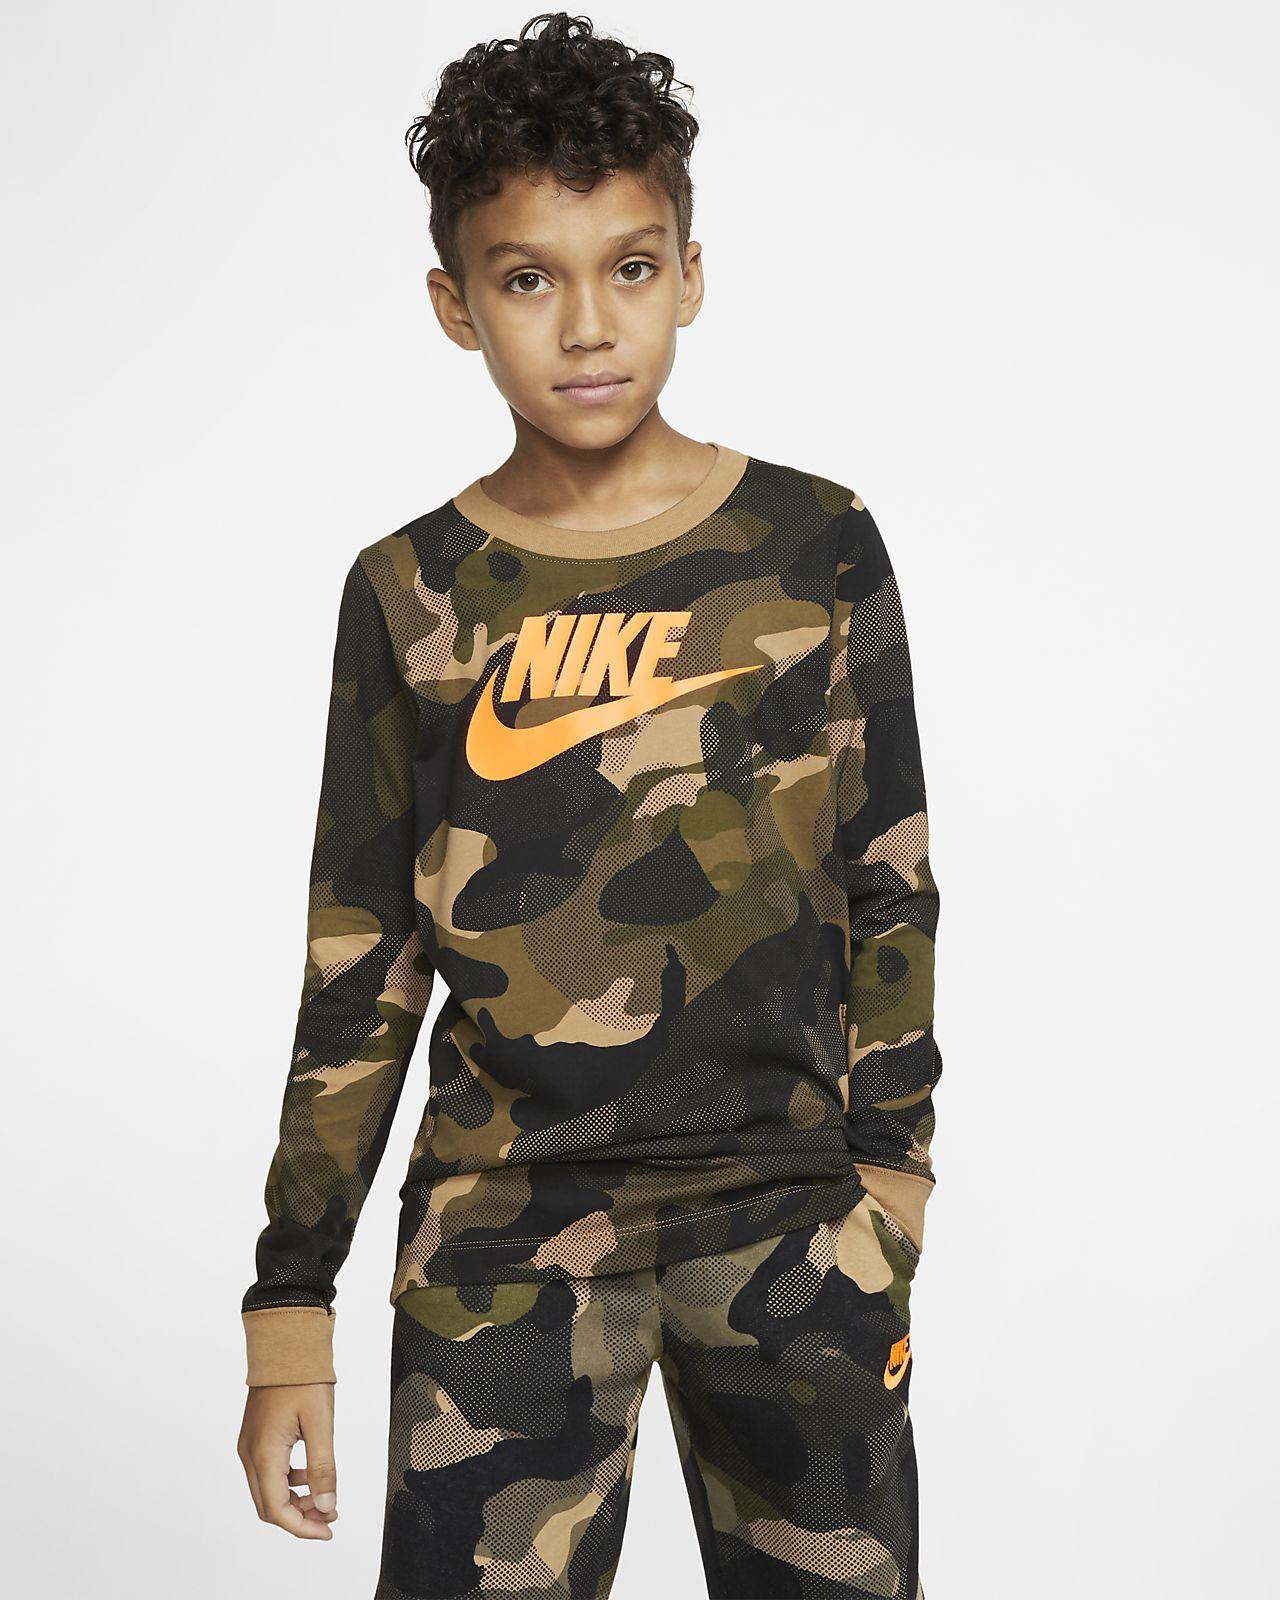 Playera de manga larga para niño talla grande Nike Sportswear